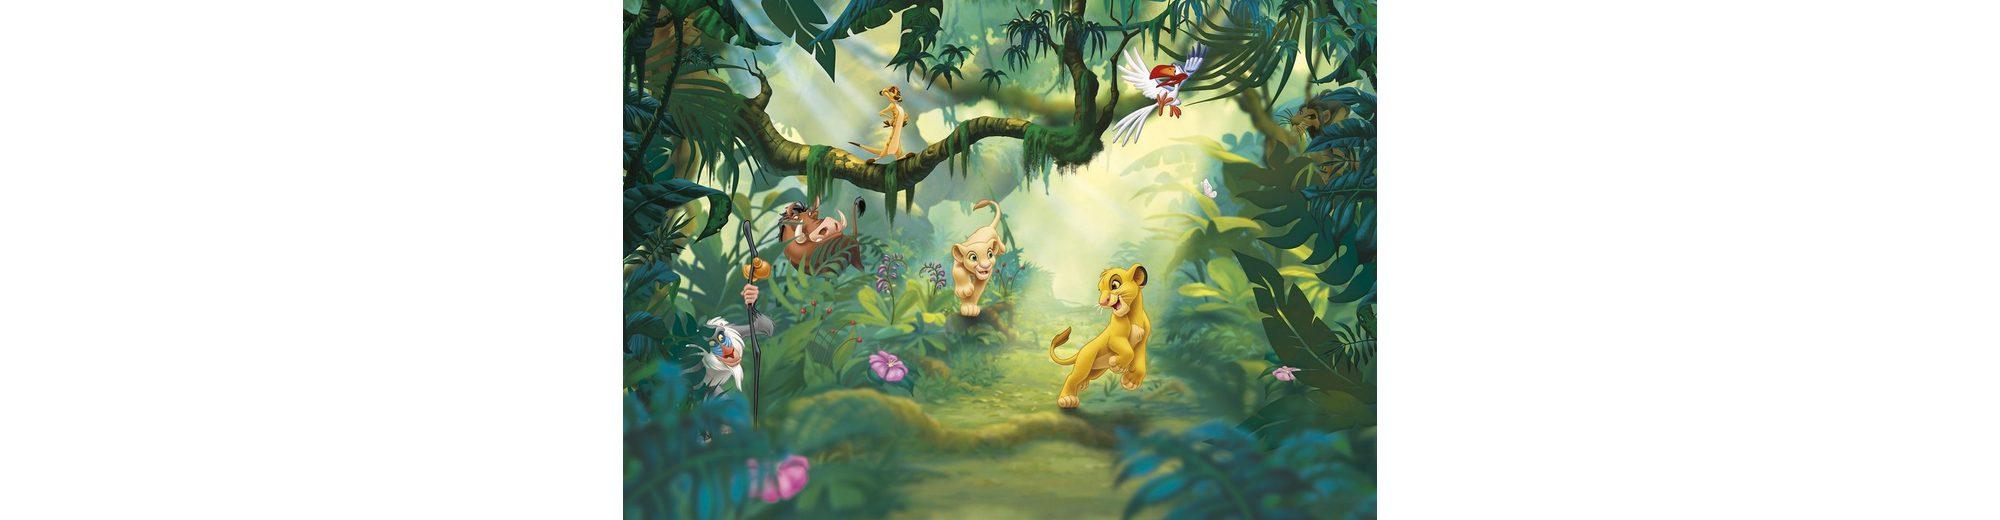 Komar, Papiertapete, » Lion King Jungle«, 368/254 cm